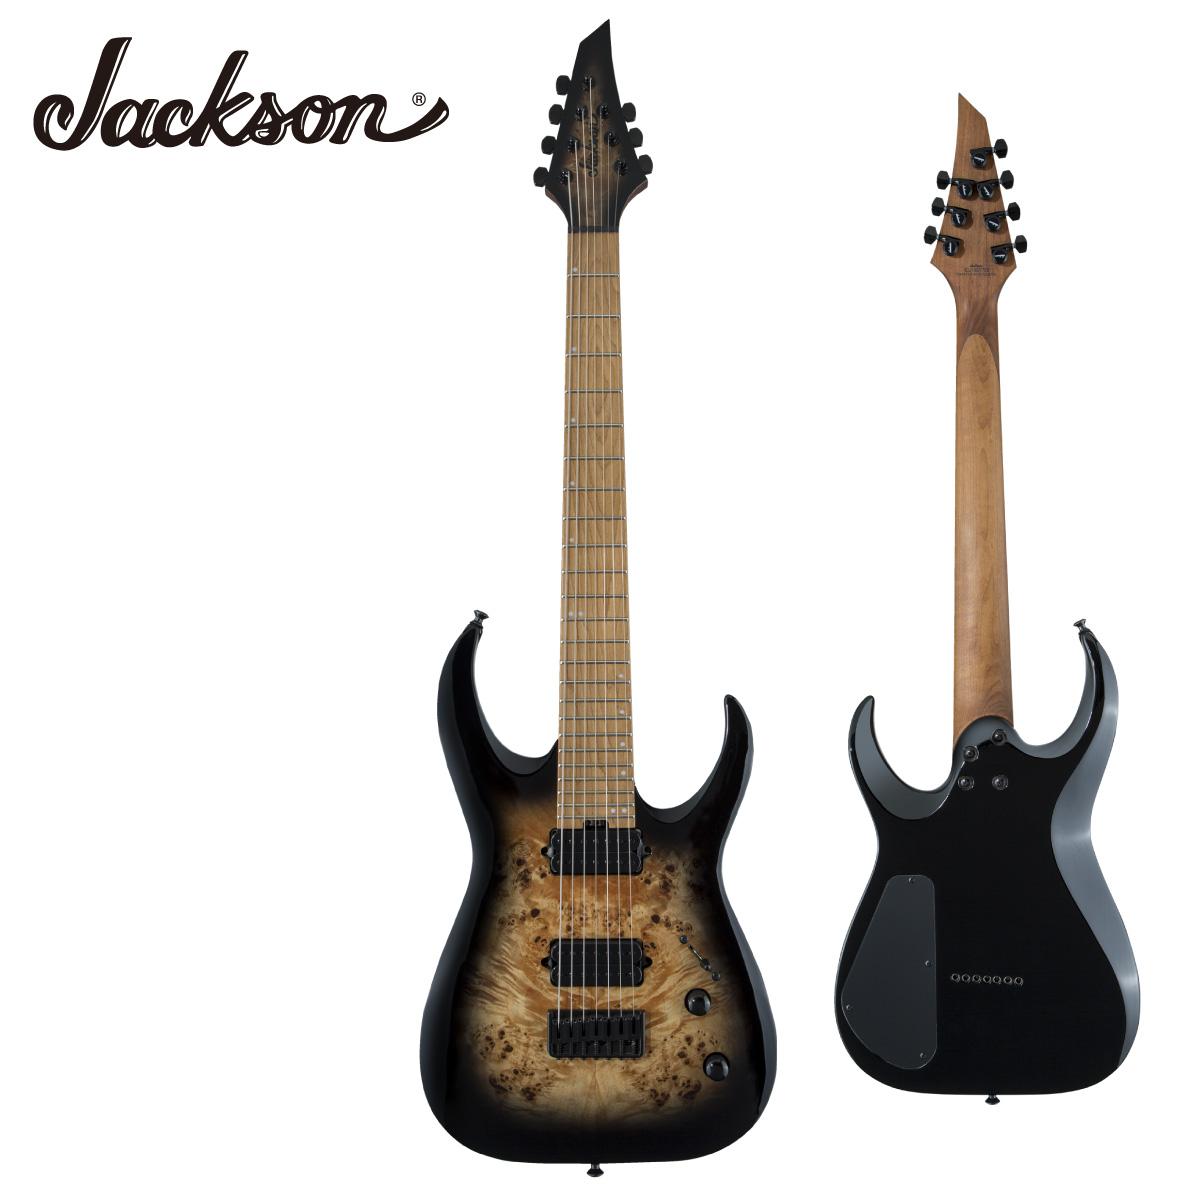 Jackson 本物 Pro Series 海外並行輸入正規品 Signature Misha Mansoor Juggernaut HT7P -Black Burst Burl- Guitar ミーシャ ジャクソン ポプラバール 新品 Electric 黒 ブラックバースト ペリフェリー マンソー エレキギター